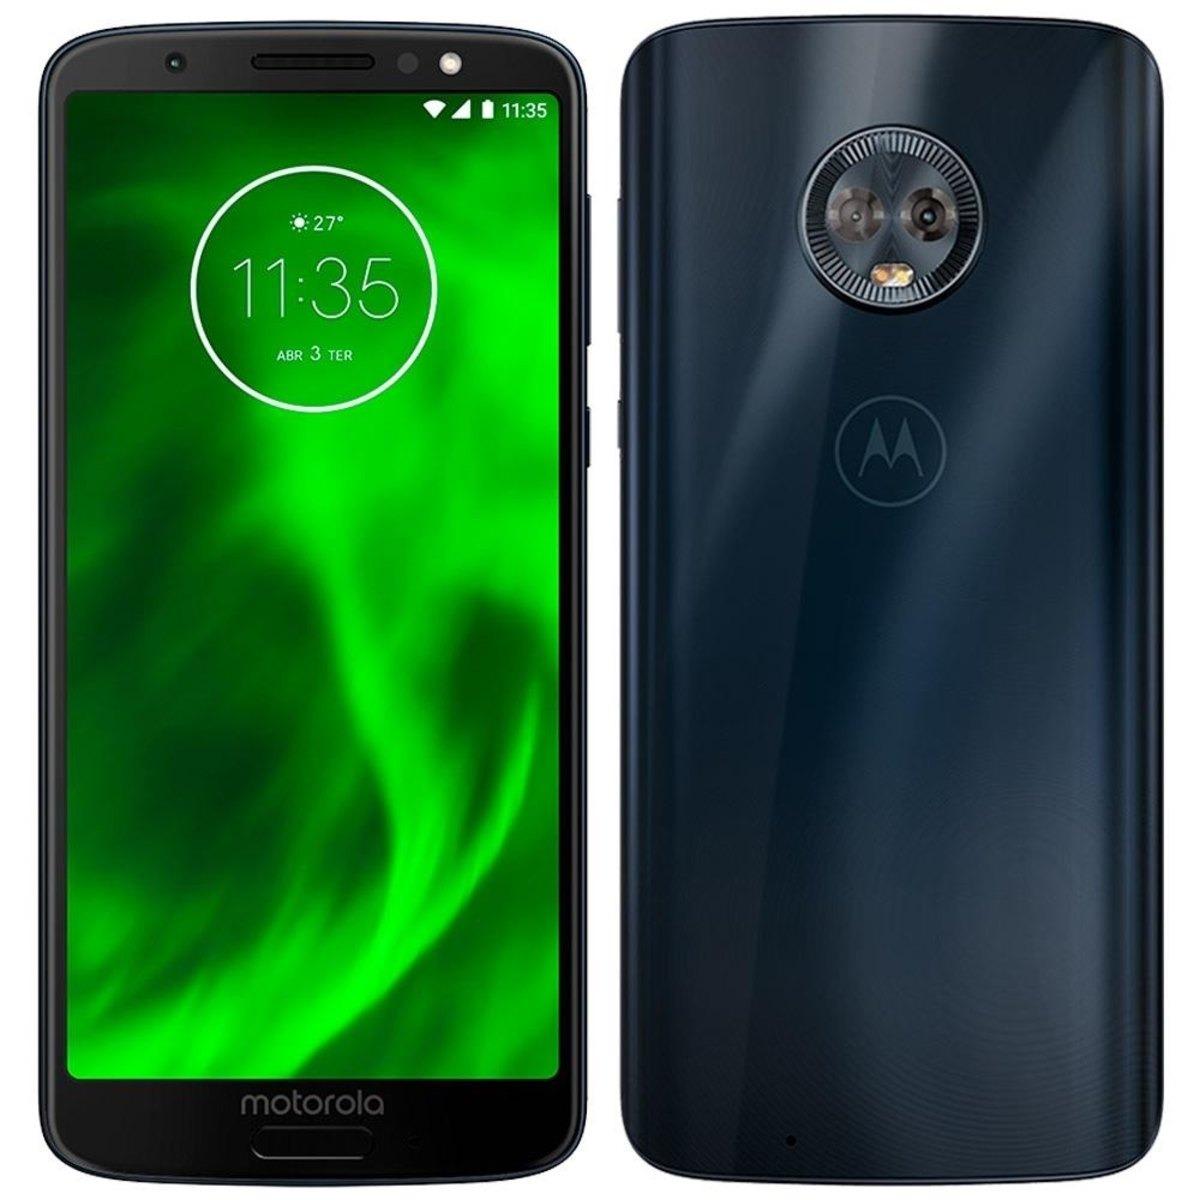 0d51ee3fd Smartphone Motorola Moto G6 Plus Xt1926 64gb Tela 5.9 Índigo - R  1.500